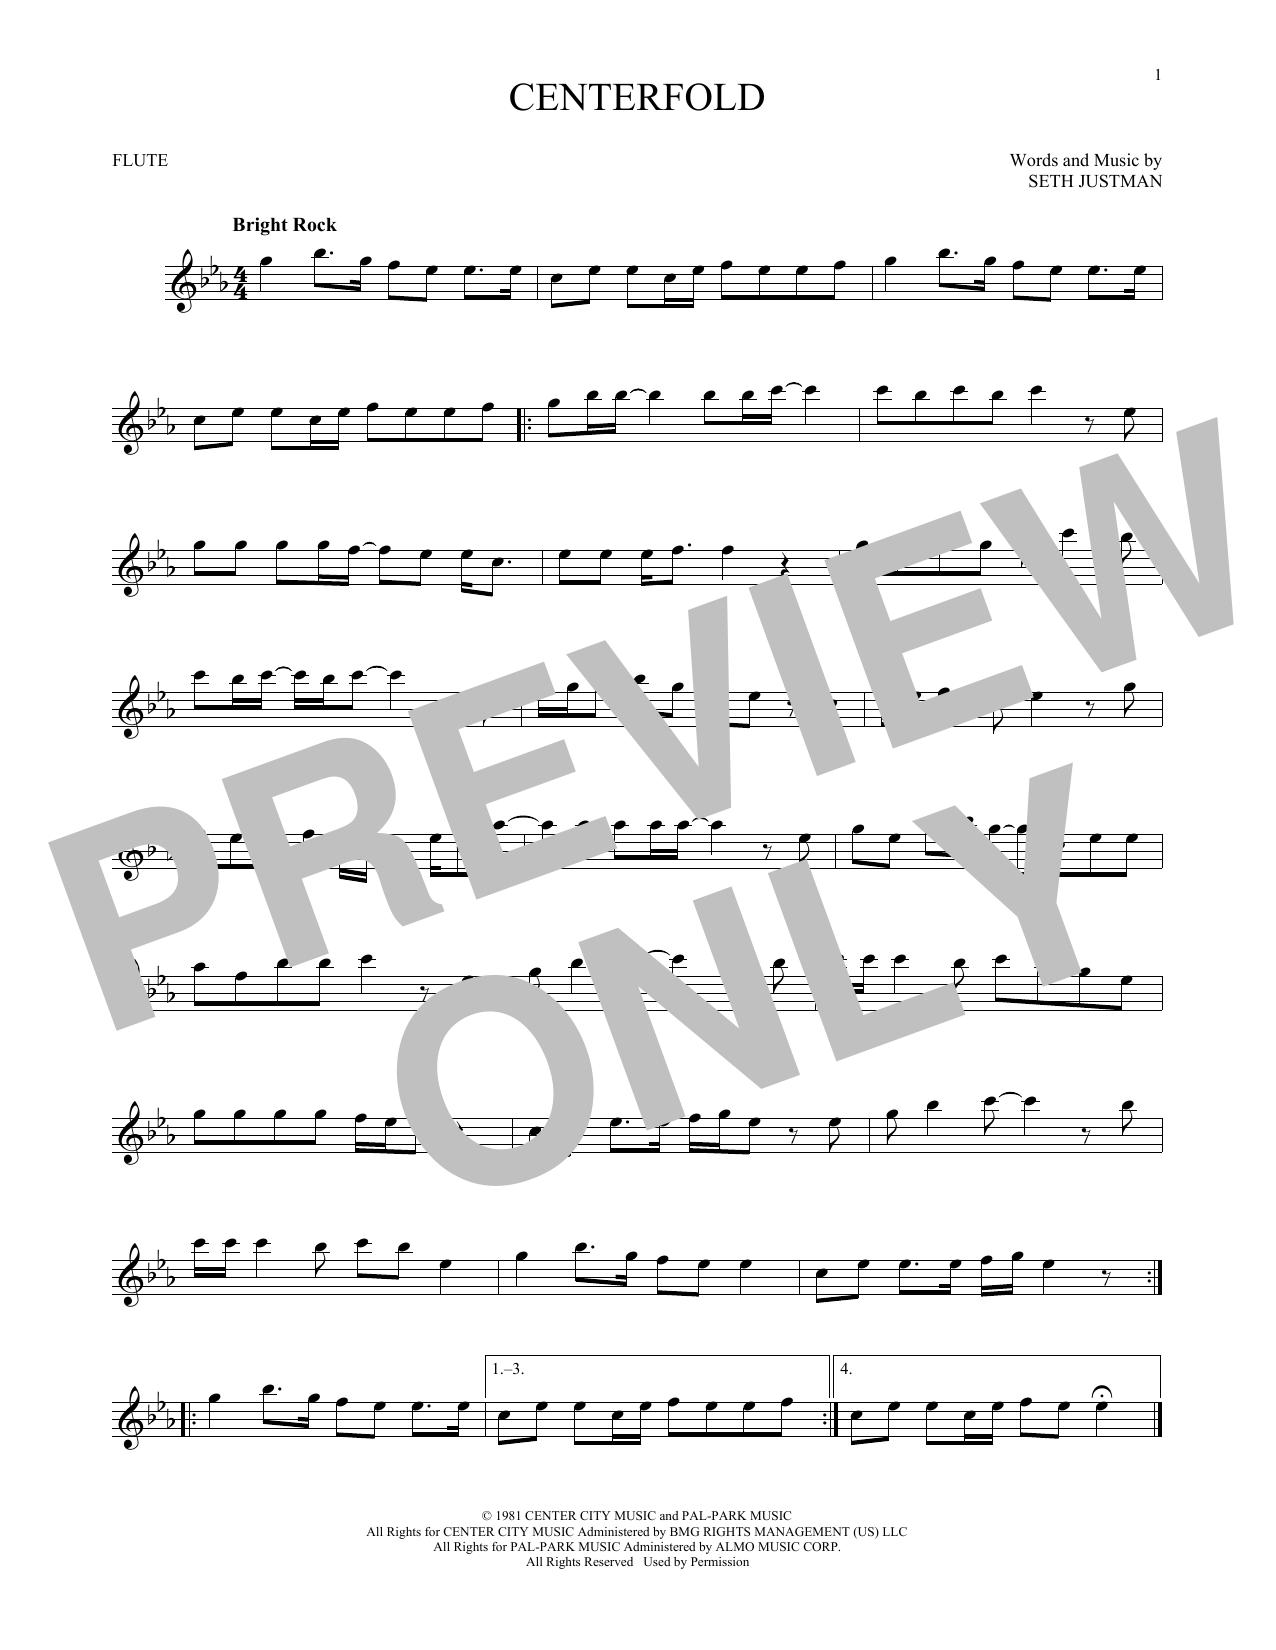 Centerfold (Flute Solo)